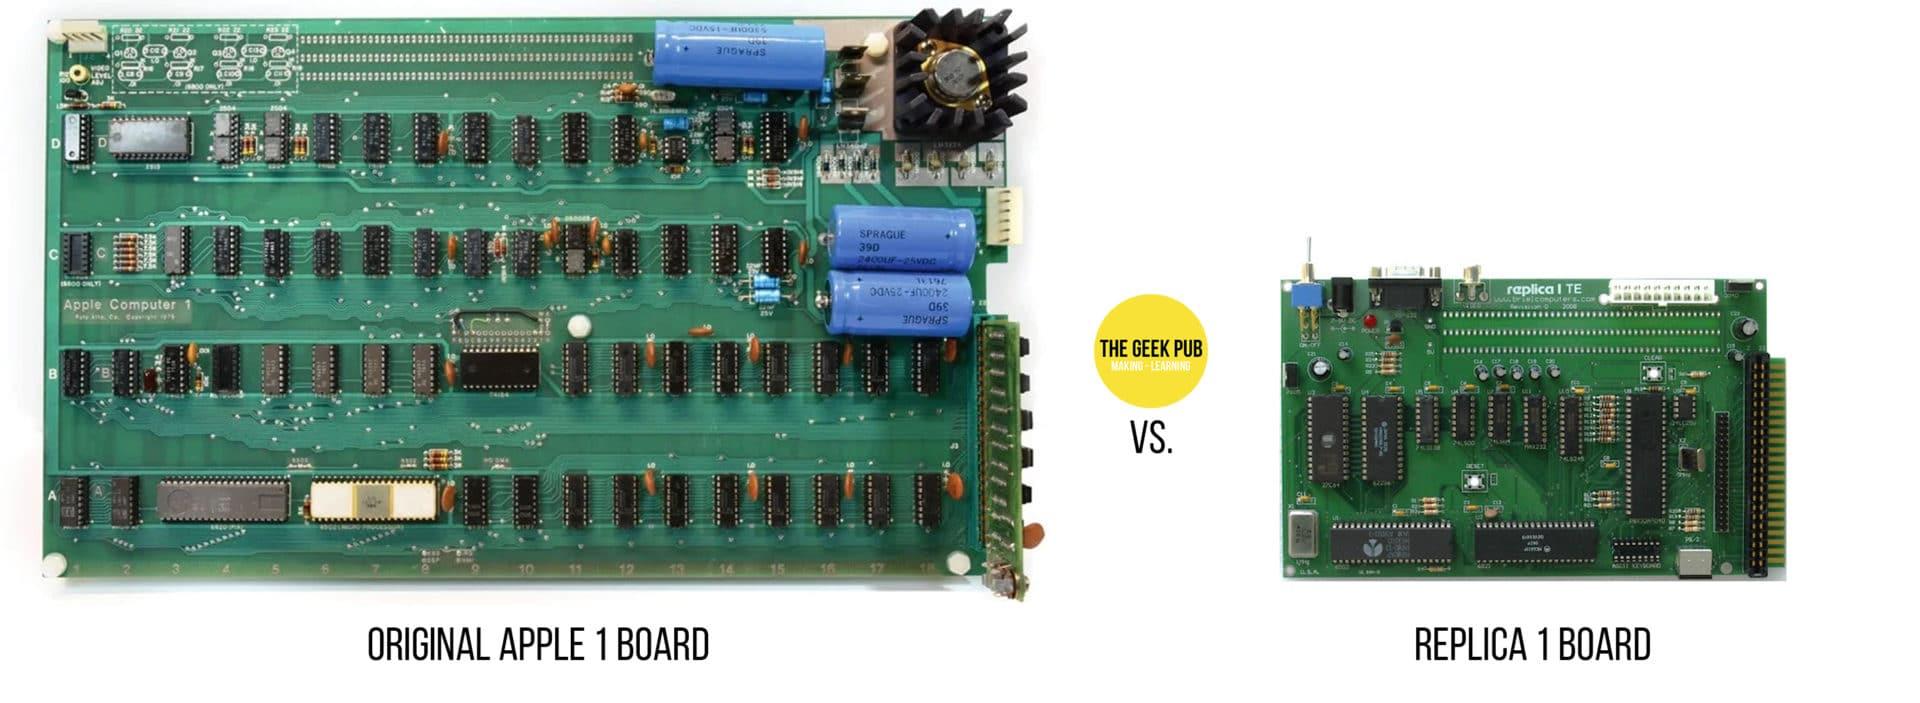 Original Apple 1 VS Replica 1